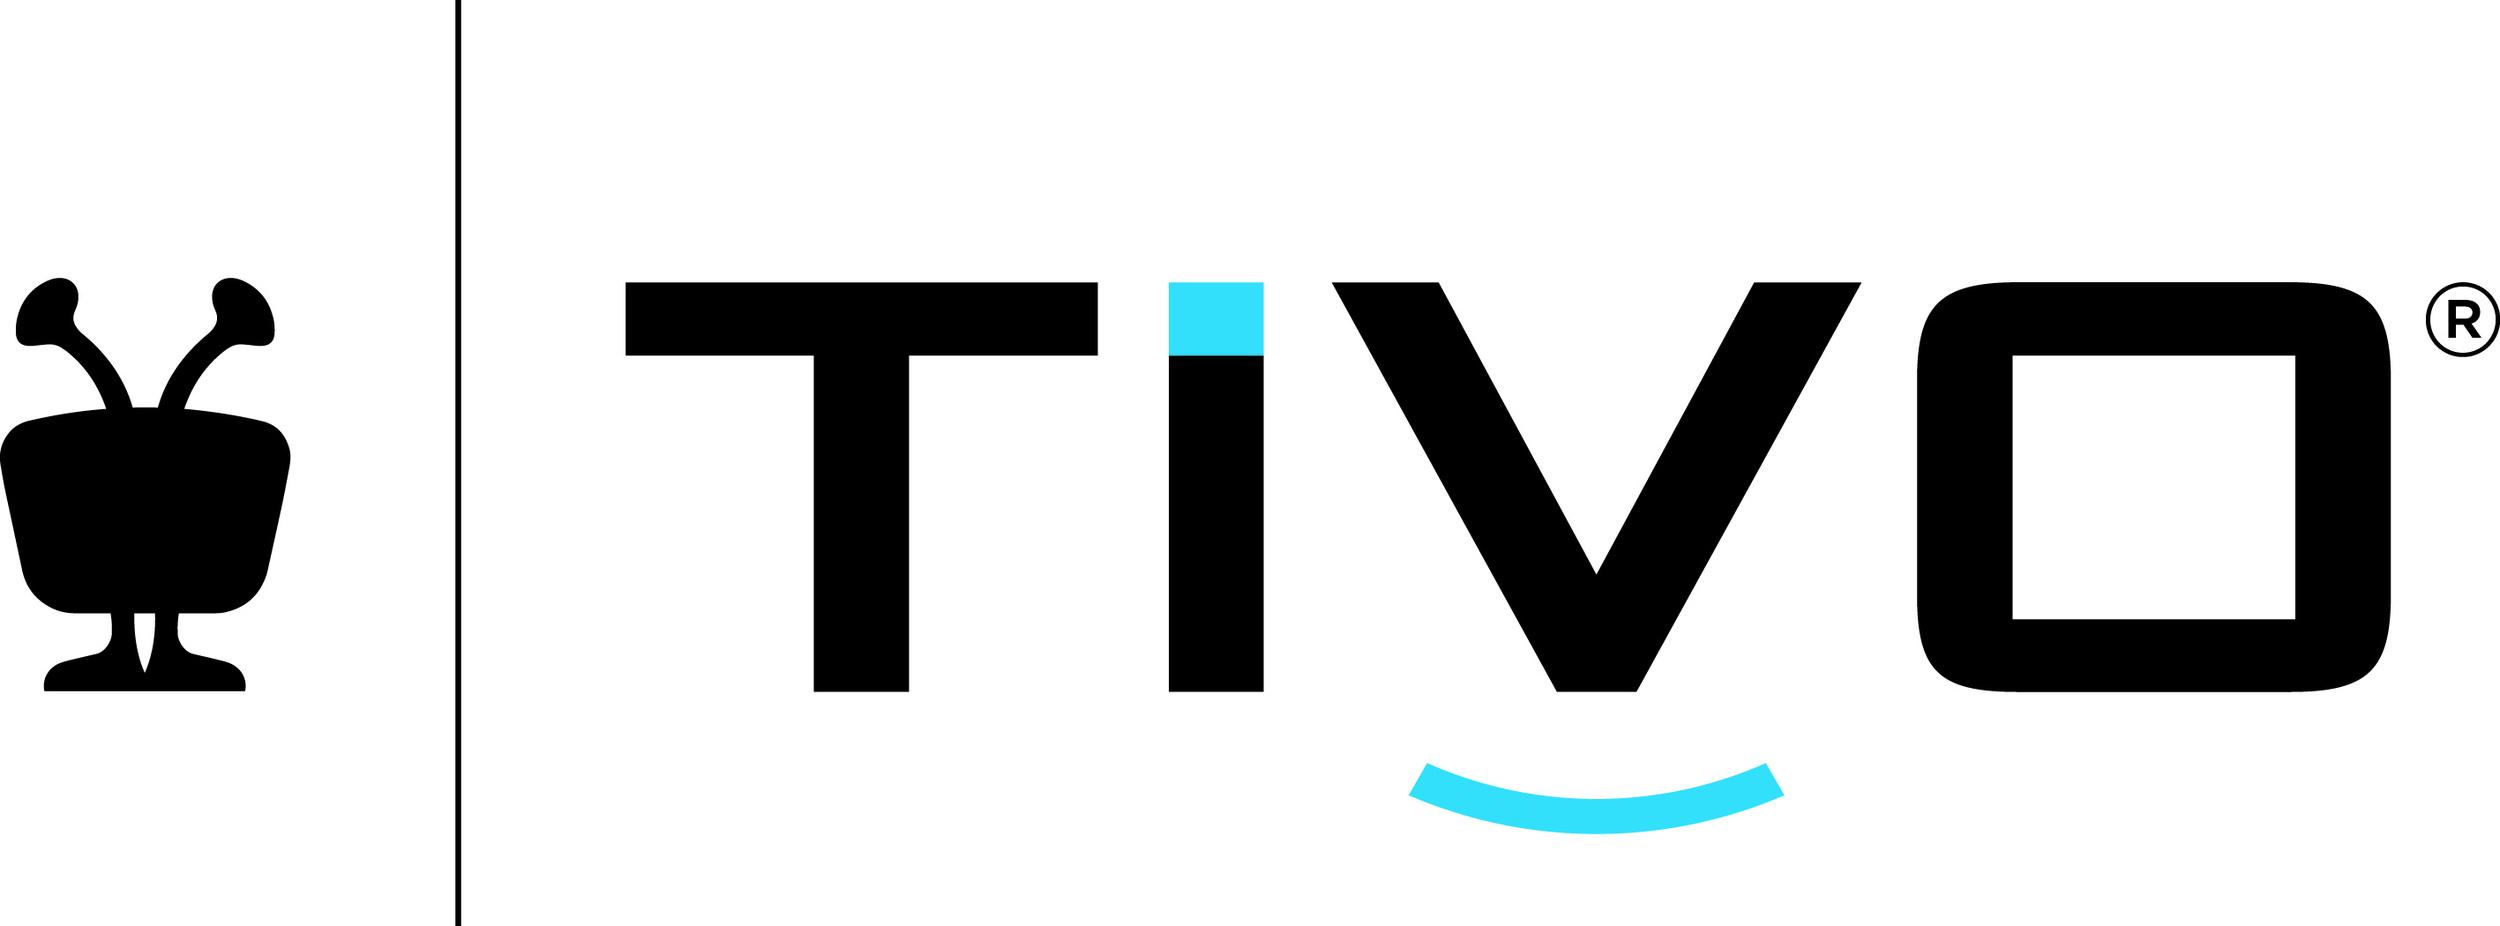 TiVo_lockup_BLK_BLUE.jpg